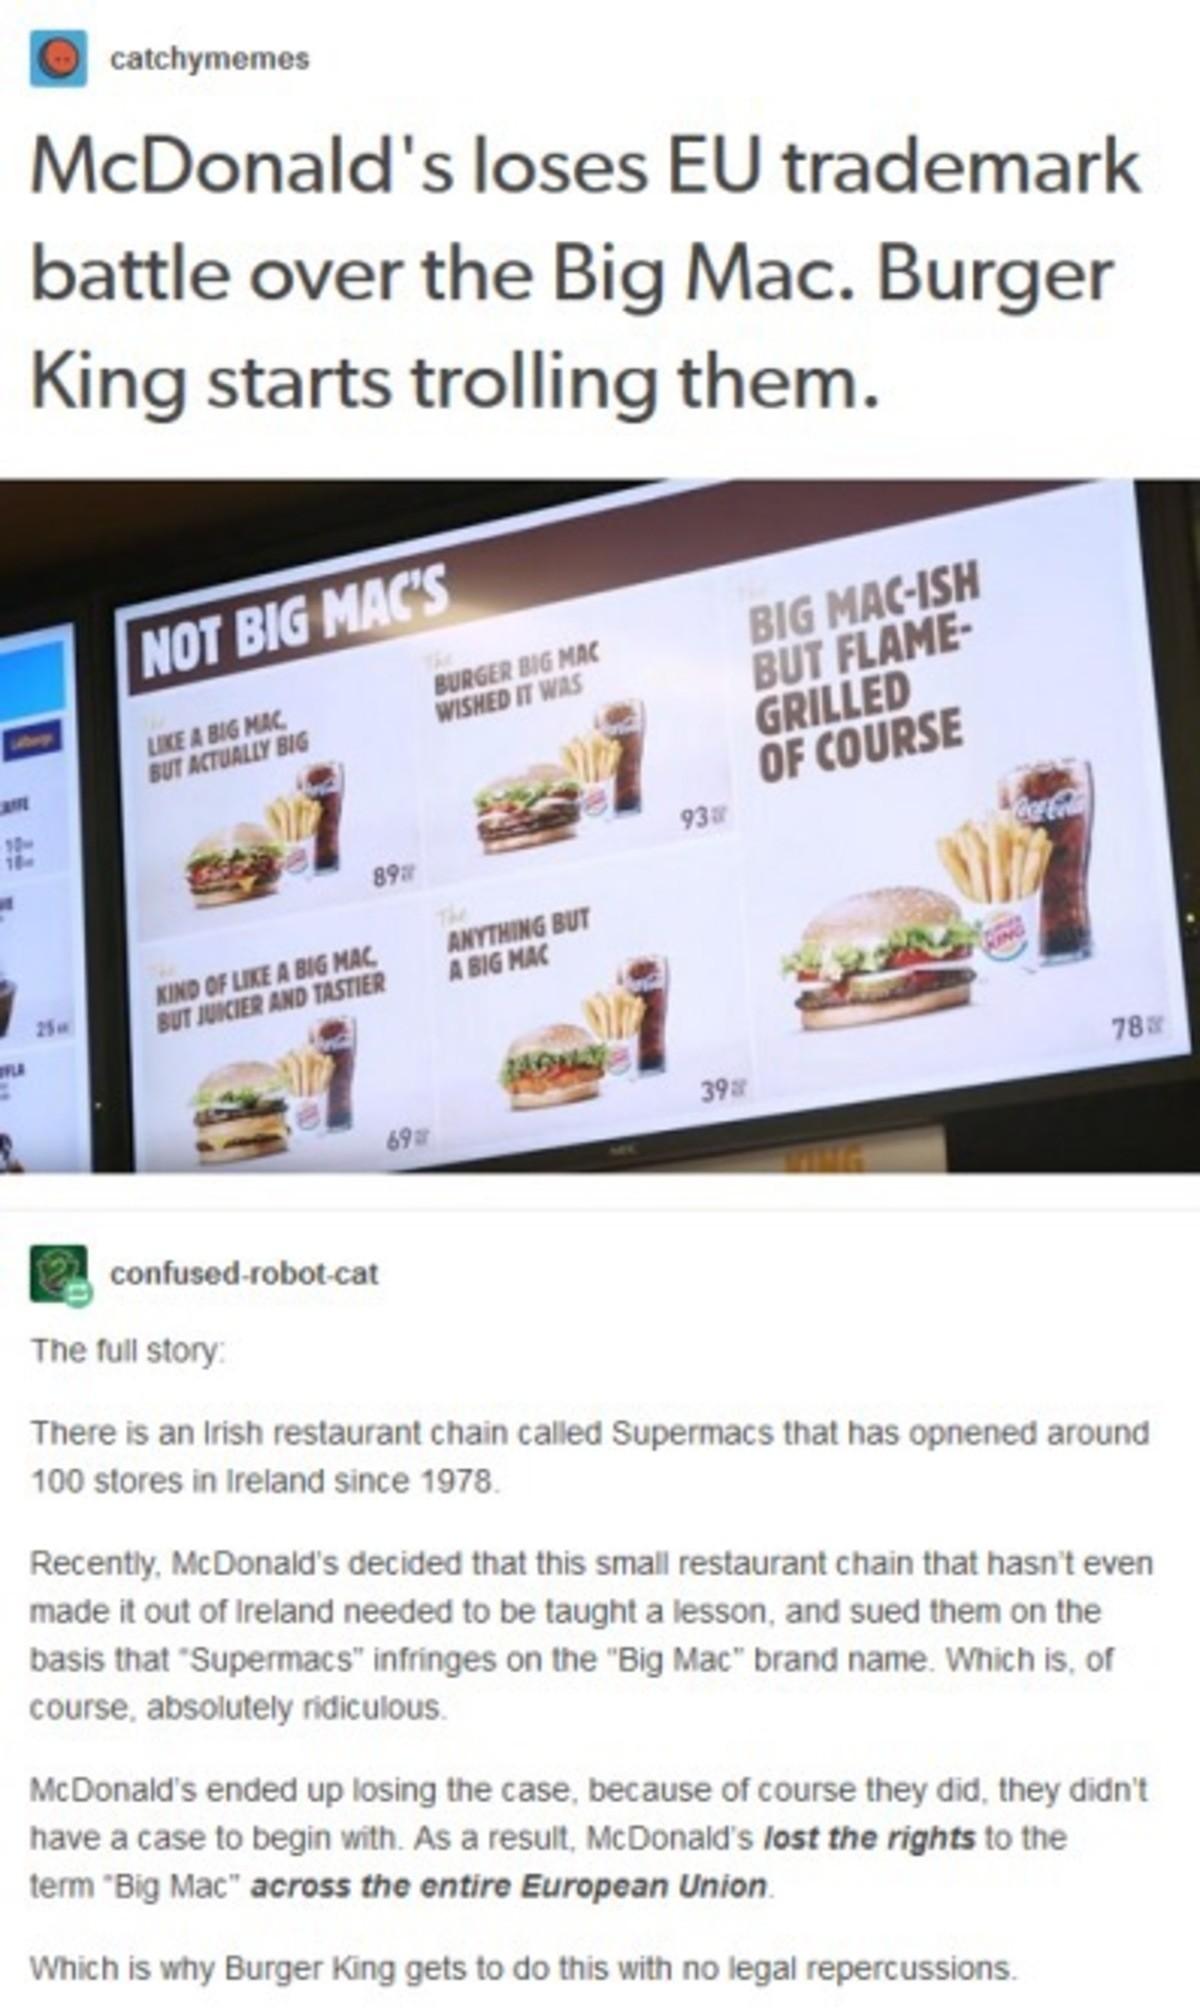 BK trolls McDonald's over lost EU trademark fight. https://www.forbes.com/sites/mahmoodkhan1/2019/02/02/lessons-from-mcdonalds-global-trademark-battles/#50955a3